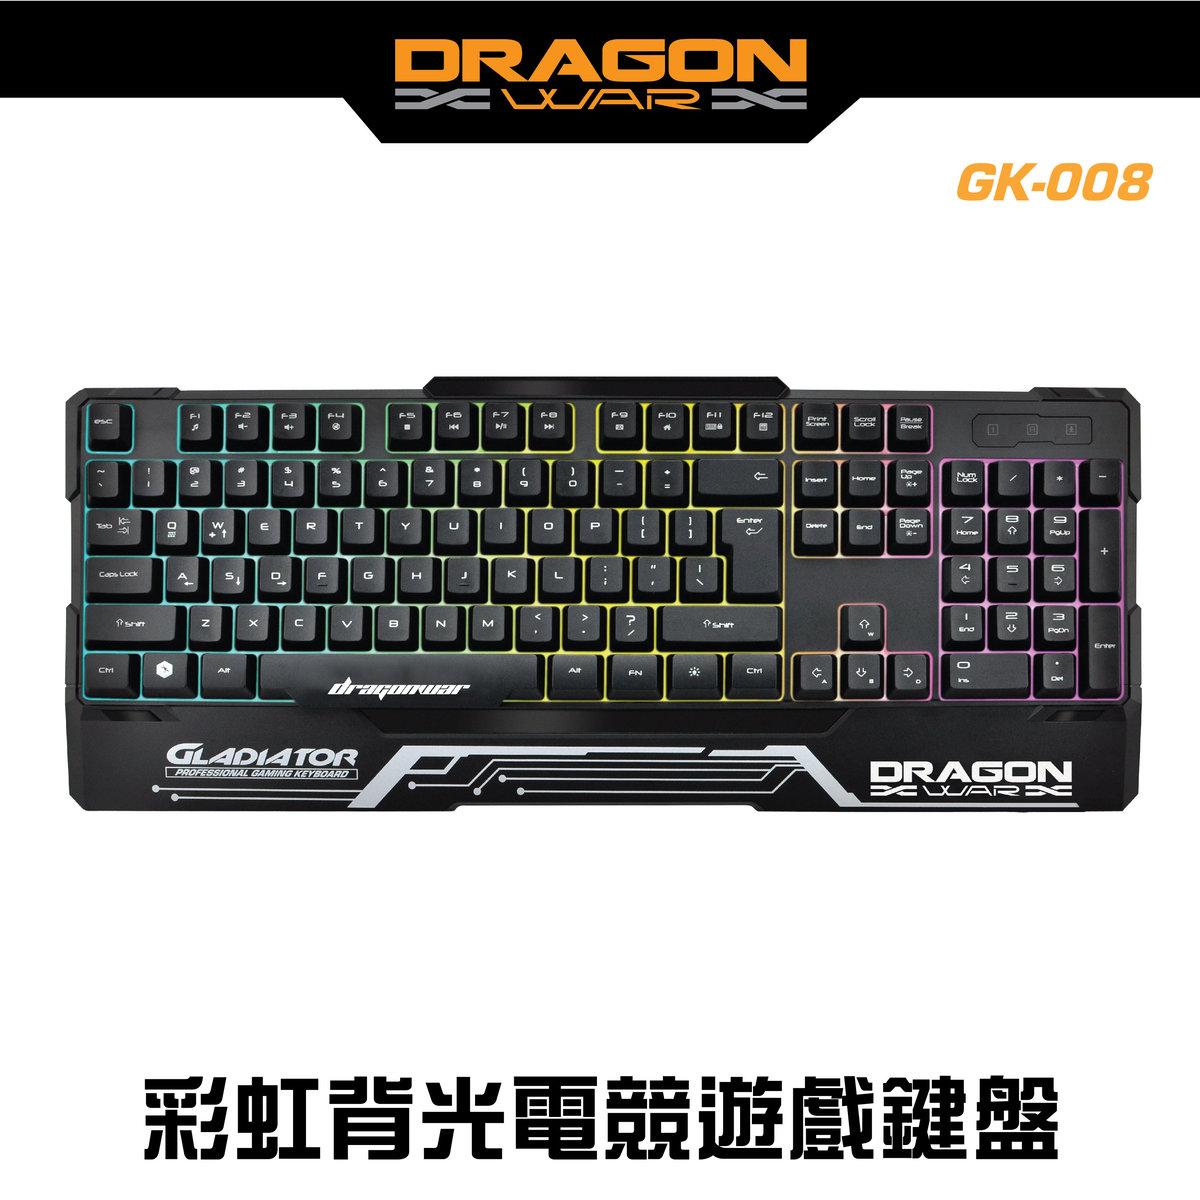 GK-008 Rainbow Illumination Semi-Mechanical Gaming Keyboard